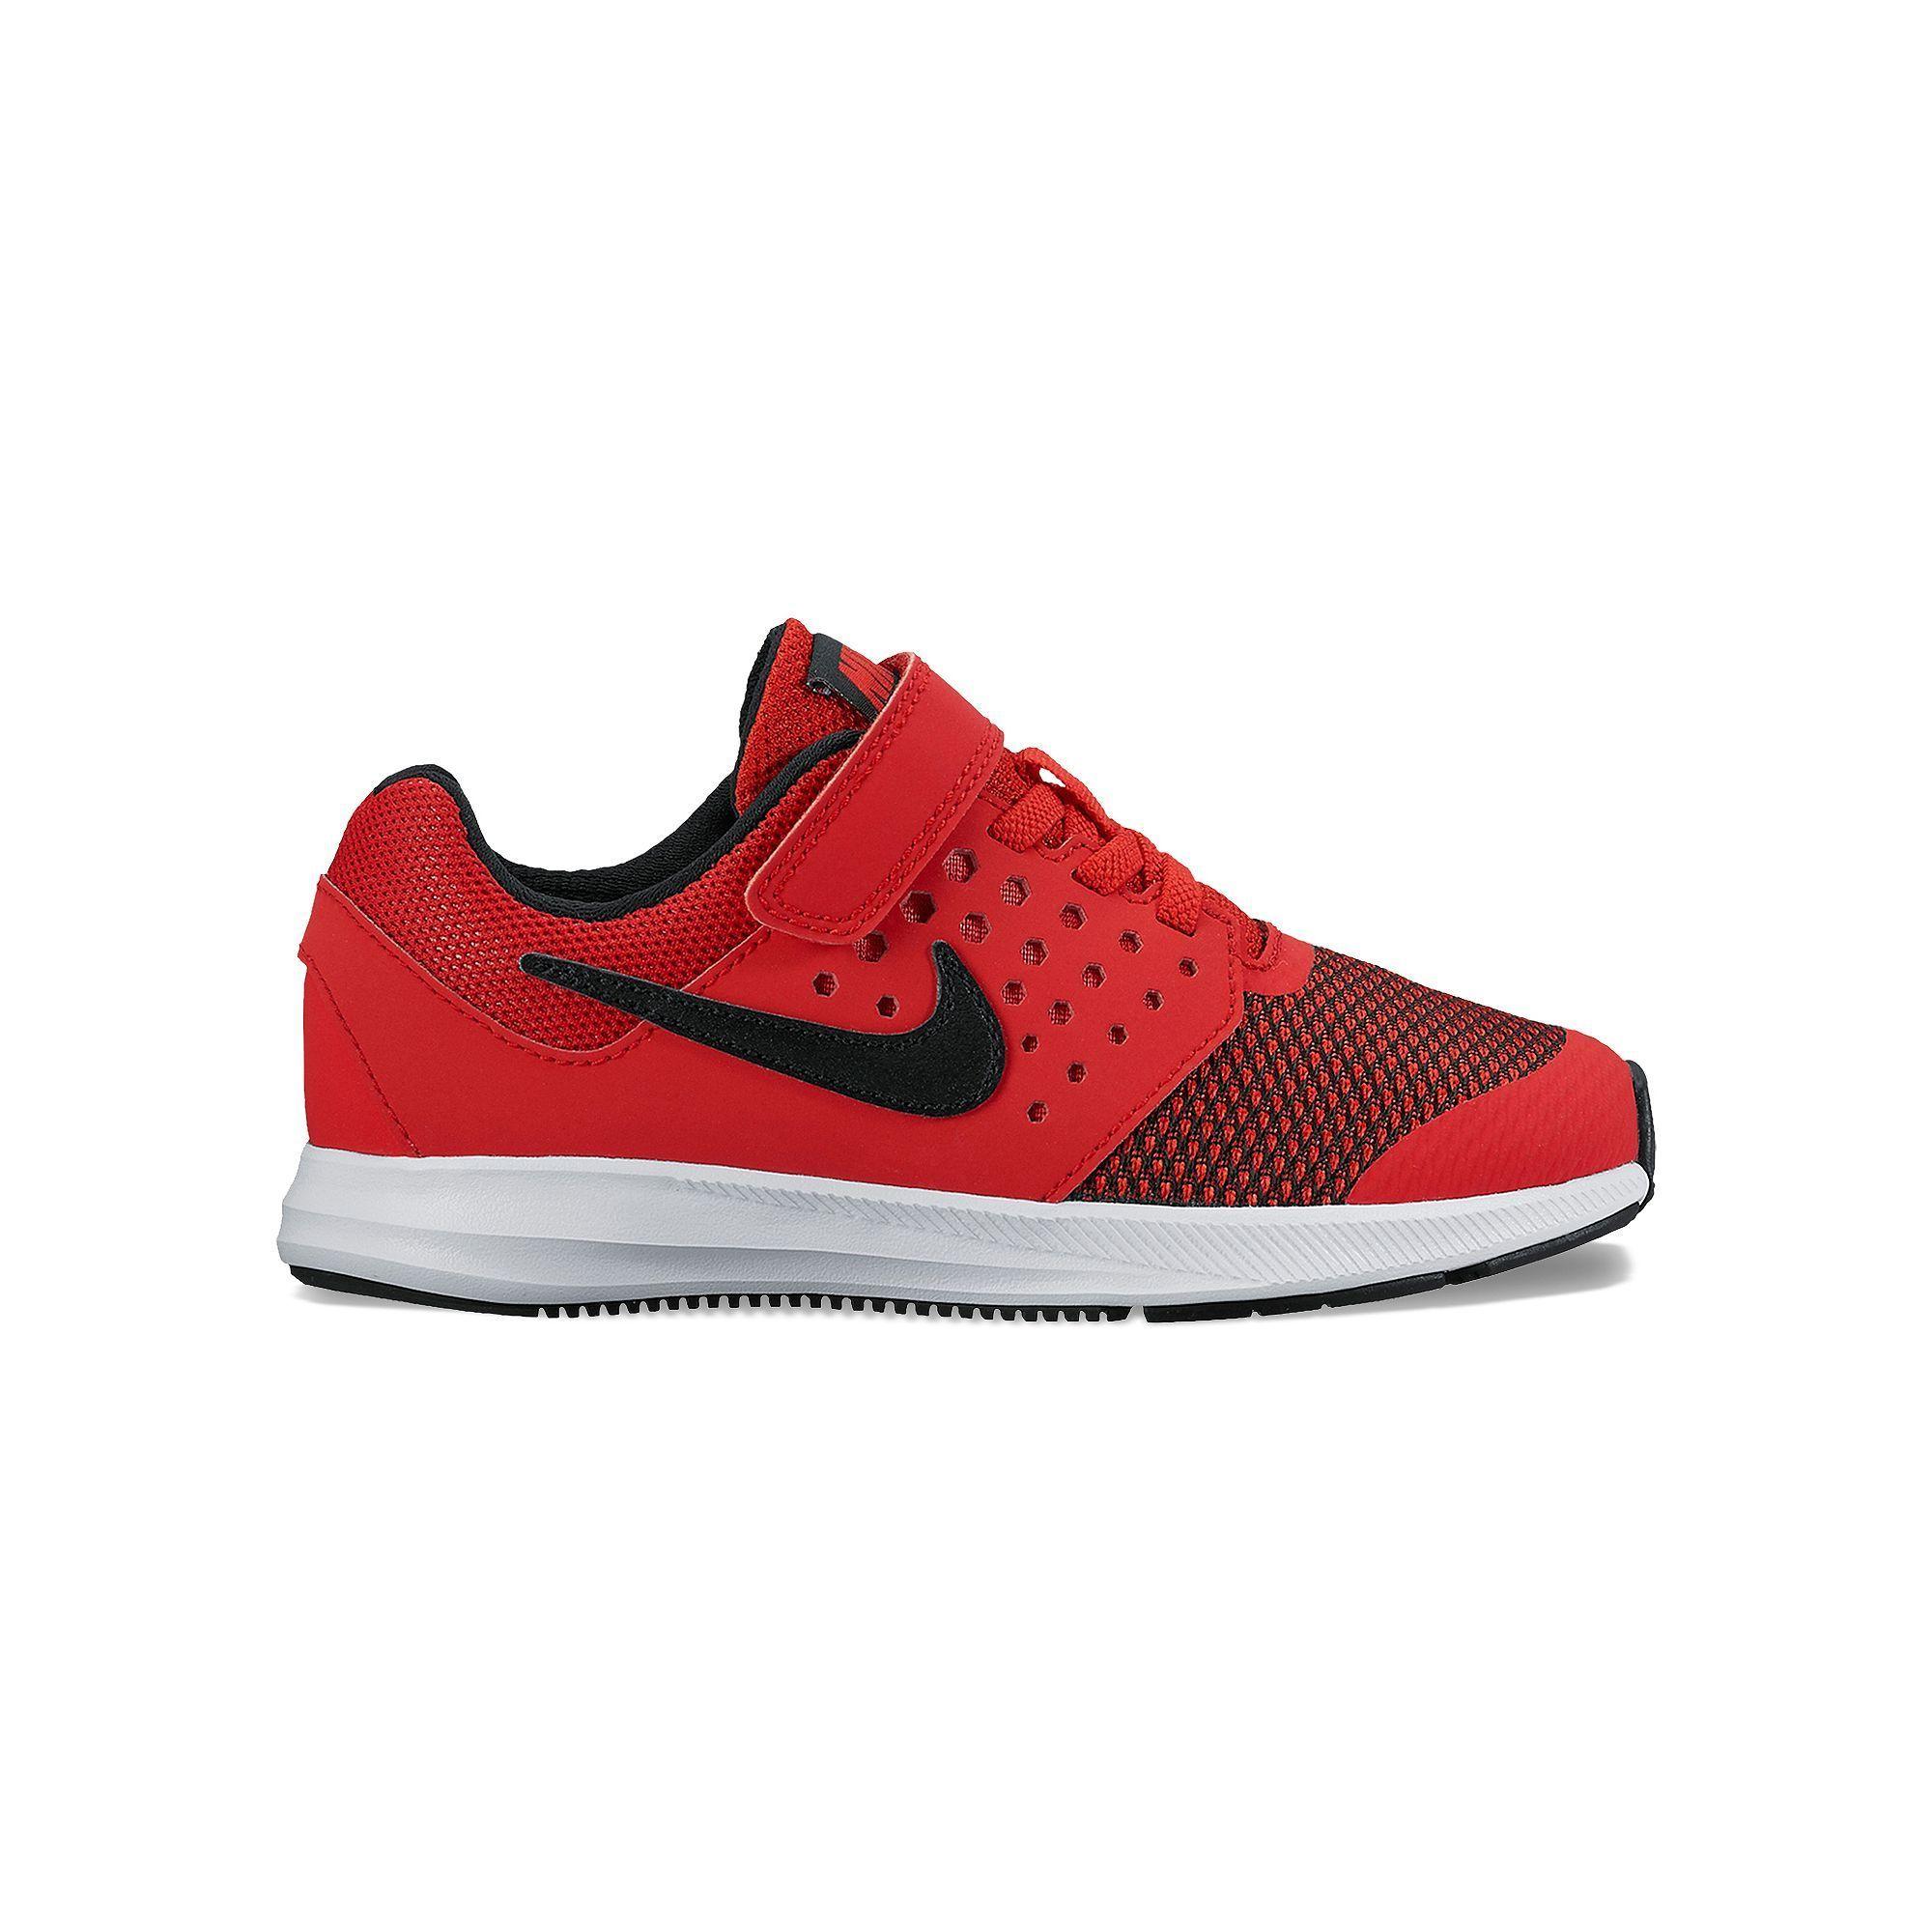 Nike Downshifter 7 Preschool Boys' Shoes, Boy's, Size: 13 ...